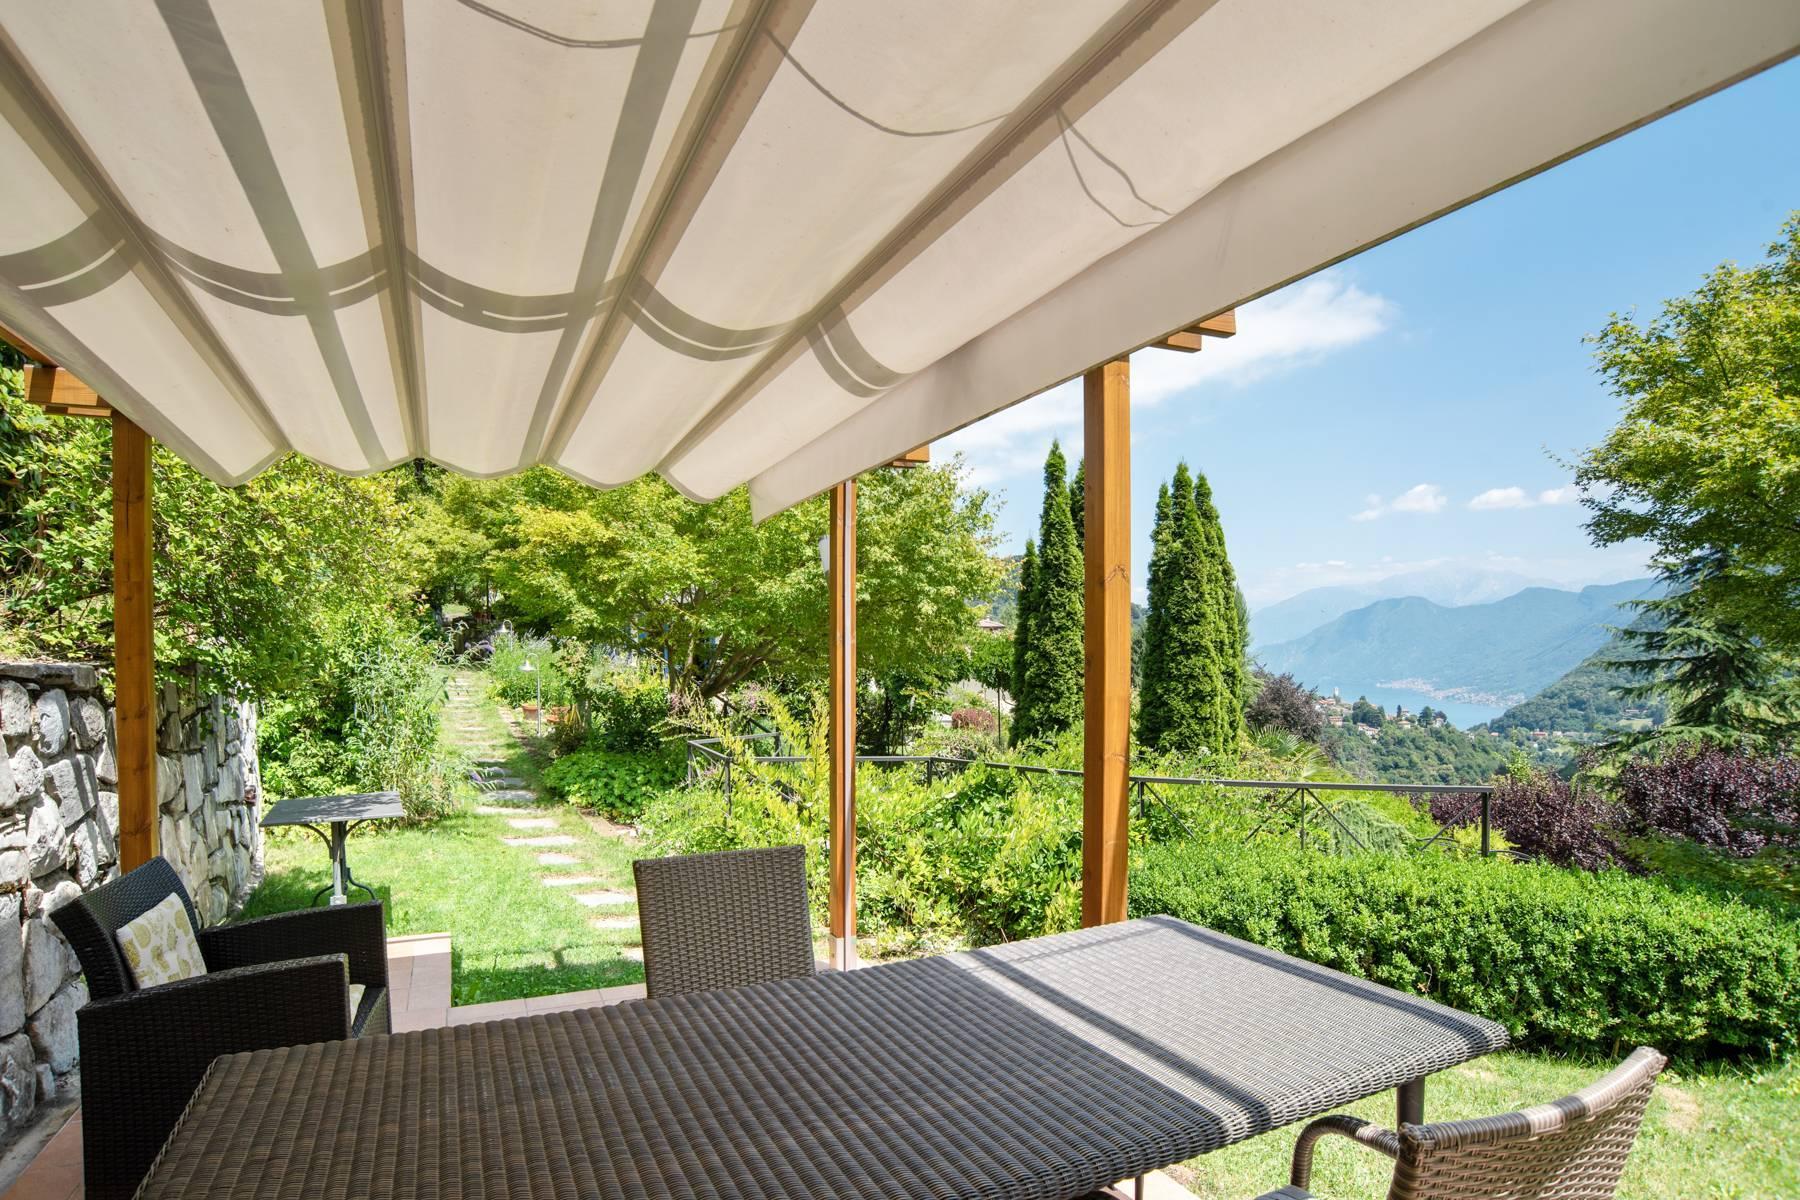 Splendida villa moderna sulla collina soleggiata sopra Argegno - 11